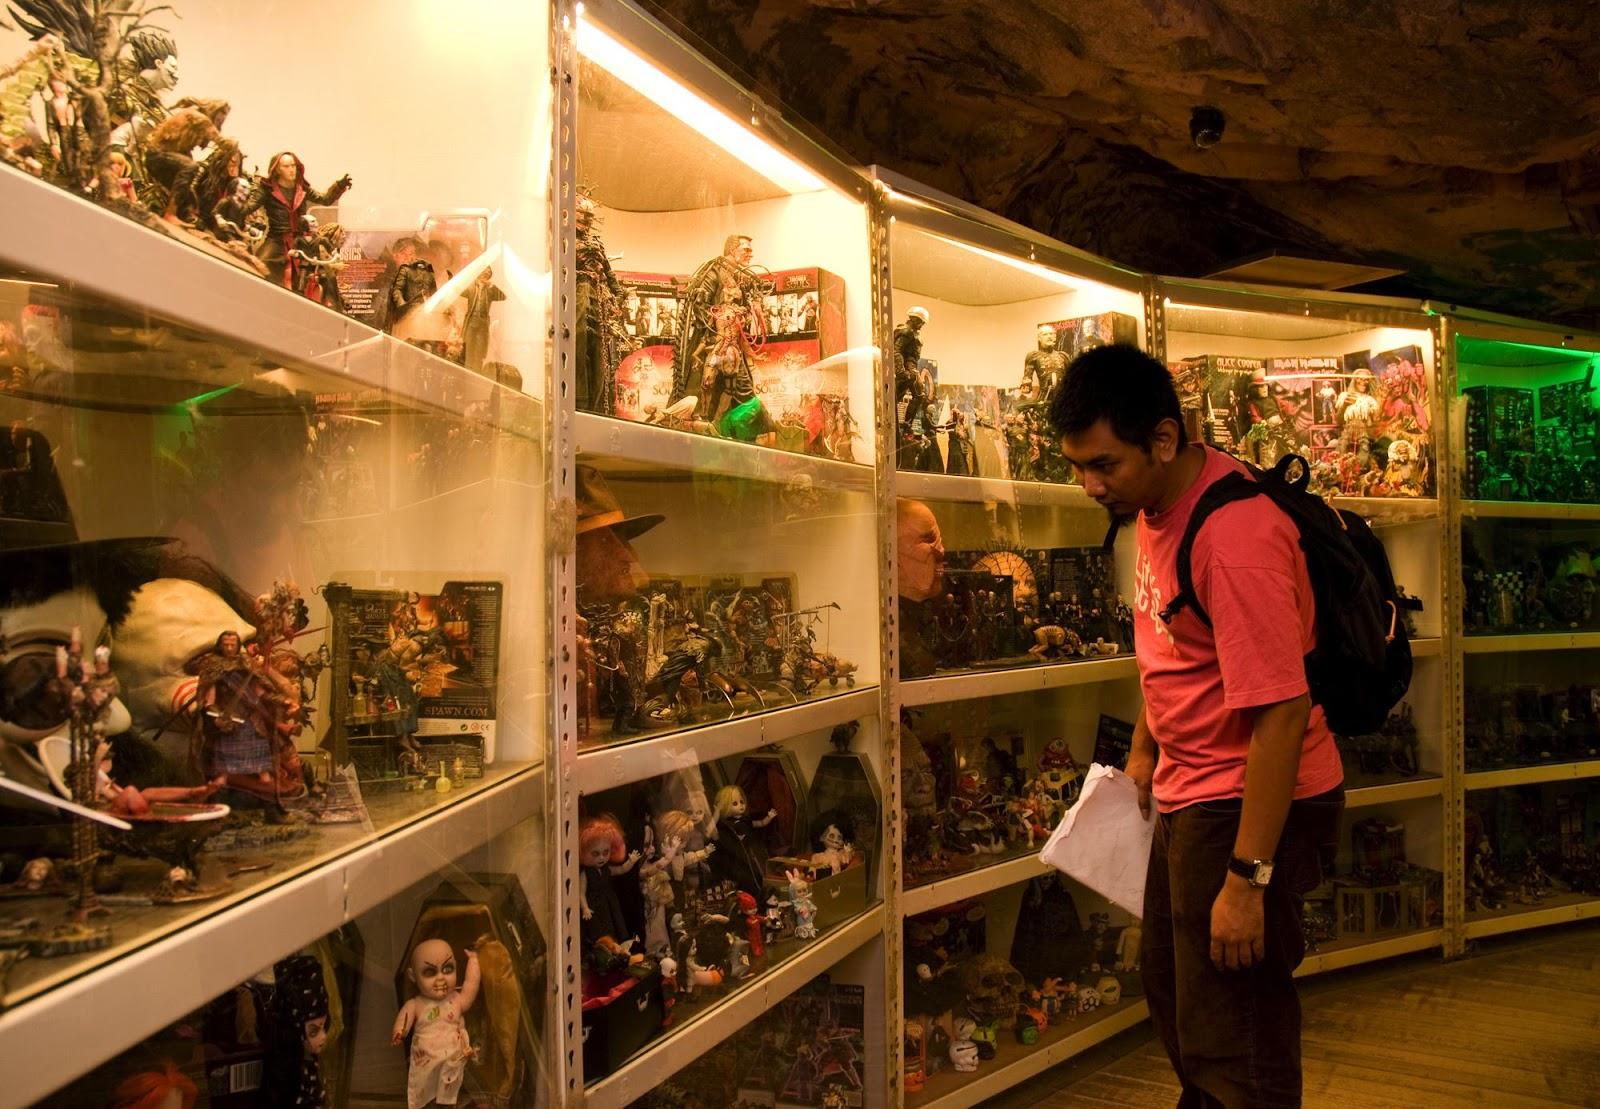 penang toys museum timeoutcom.jpg